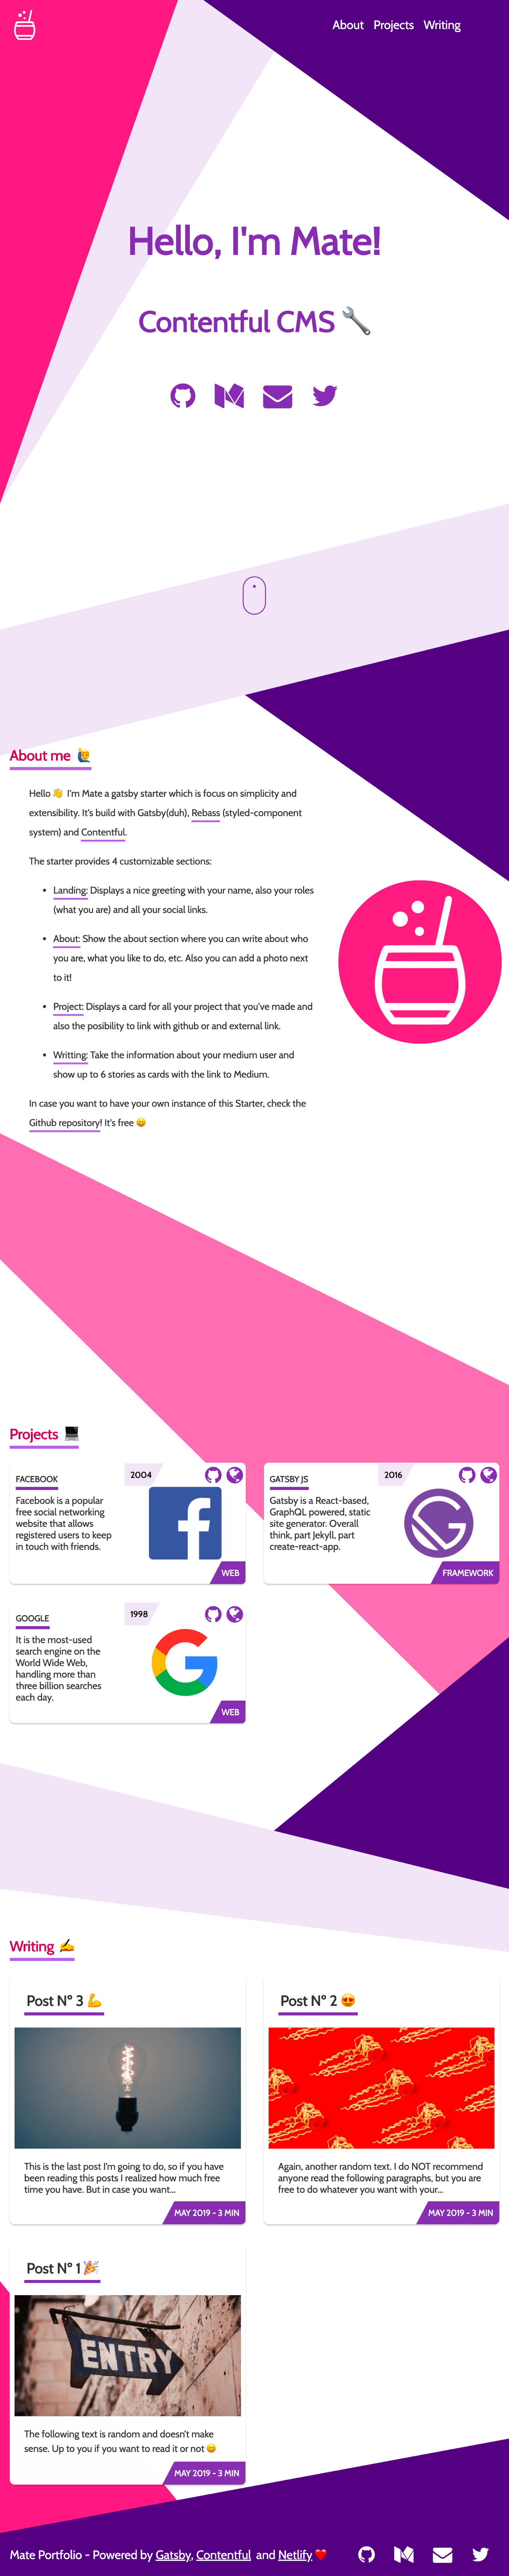 Gatsby Starter Mate — Landing Page